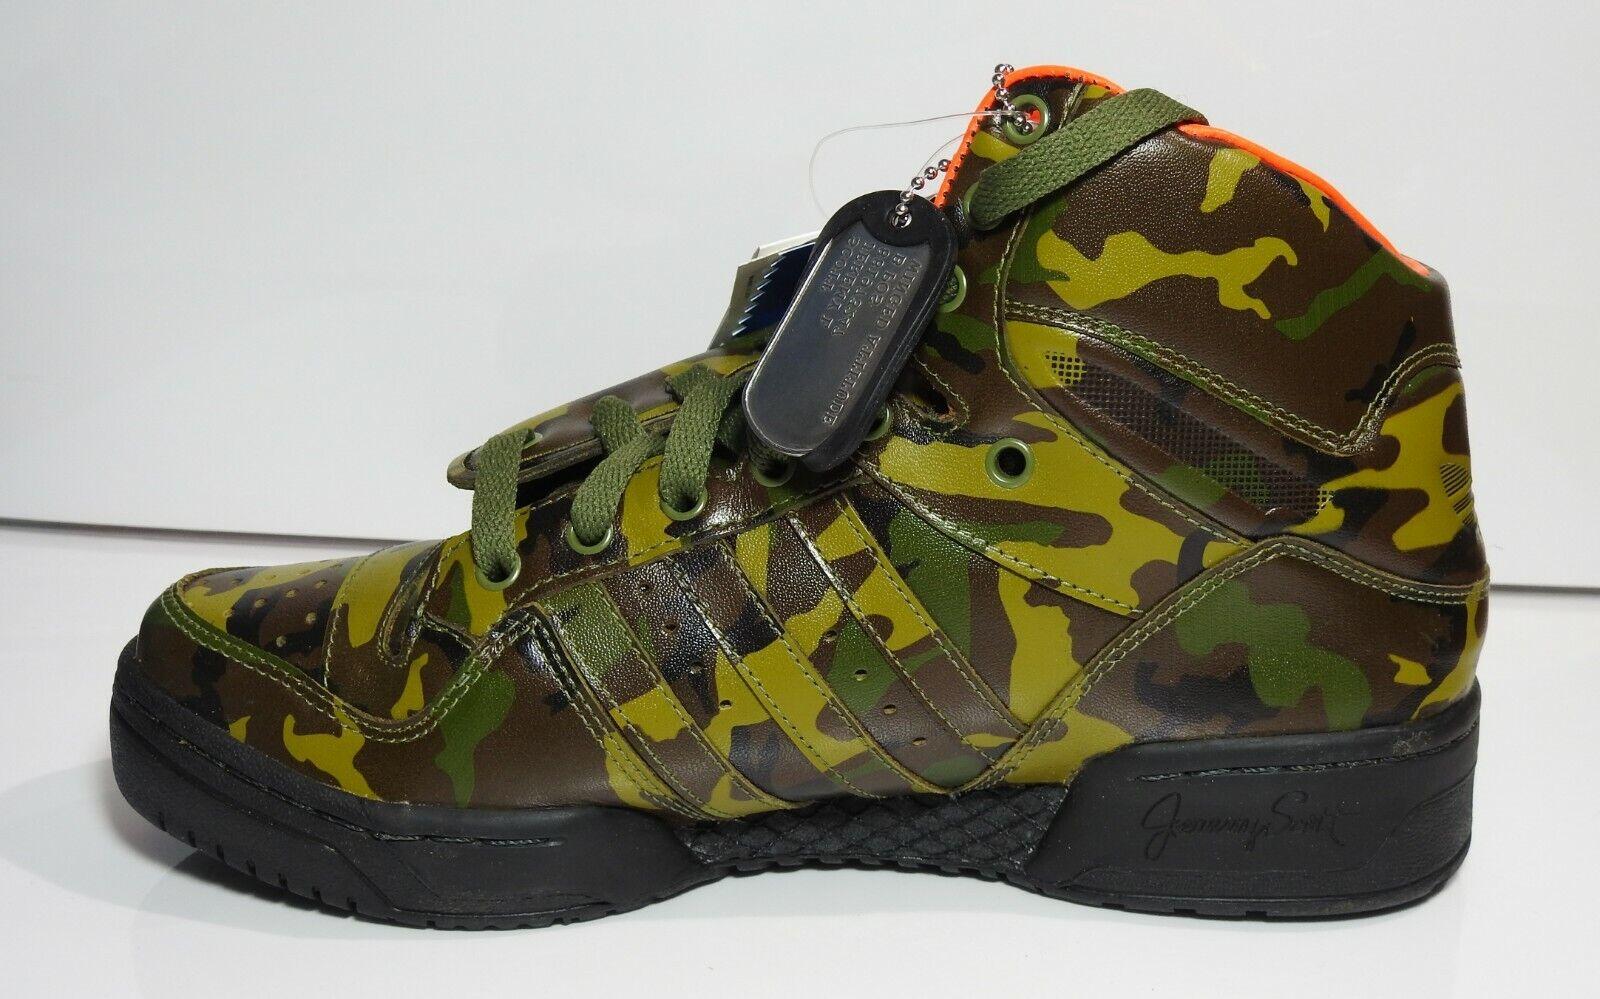 Adidas jeremy scott js wings camo  money bear flag 2.0 g50726 gold